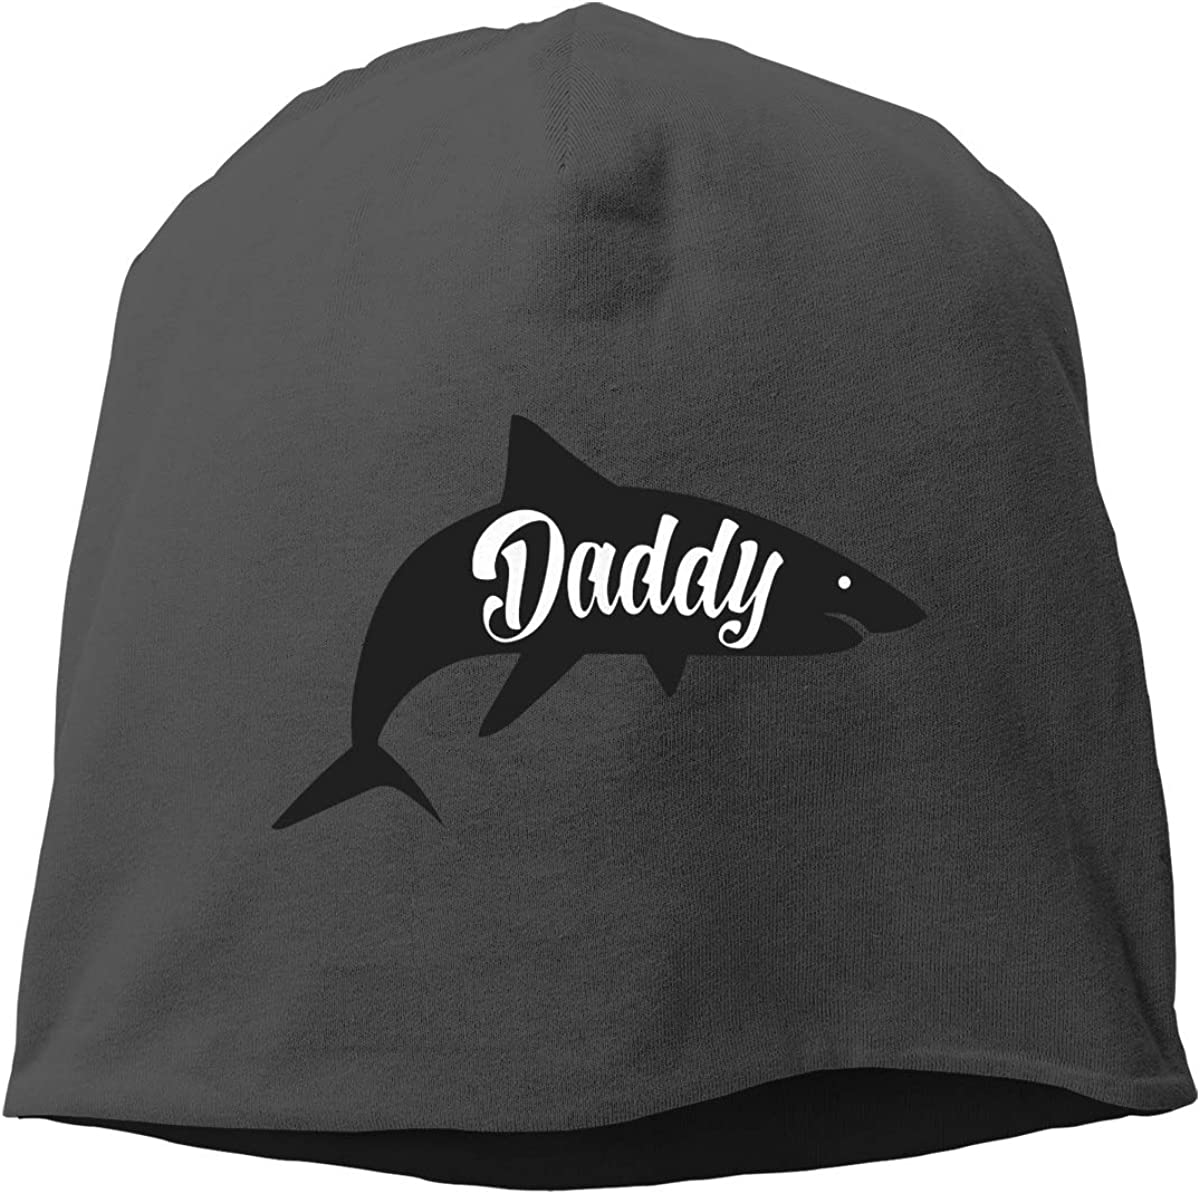 Daddy Shark Skull Cap Helmet Liner Beanie Cap for Men Hip Hop Hedging Head Hat